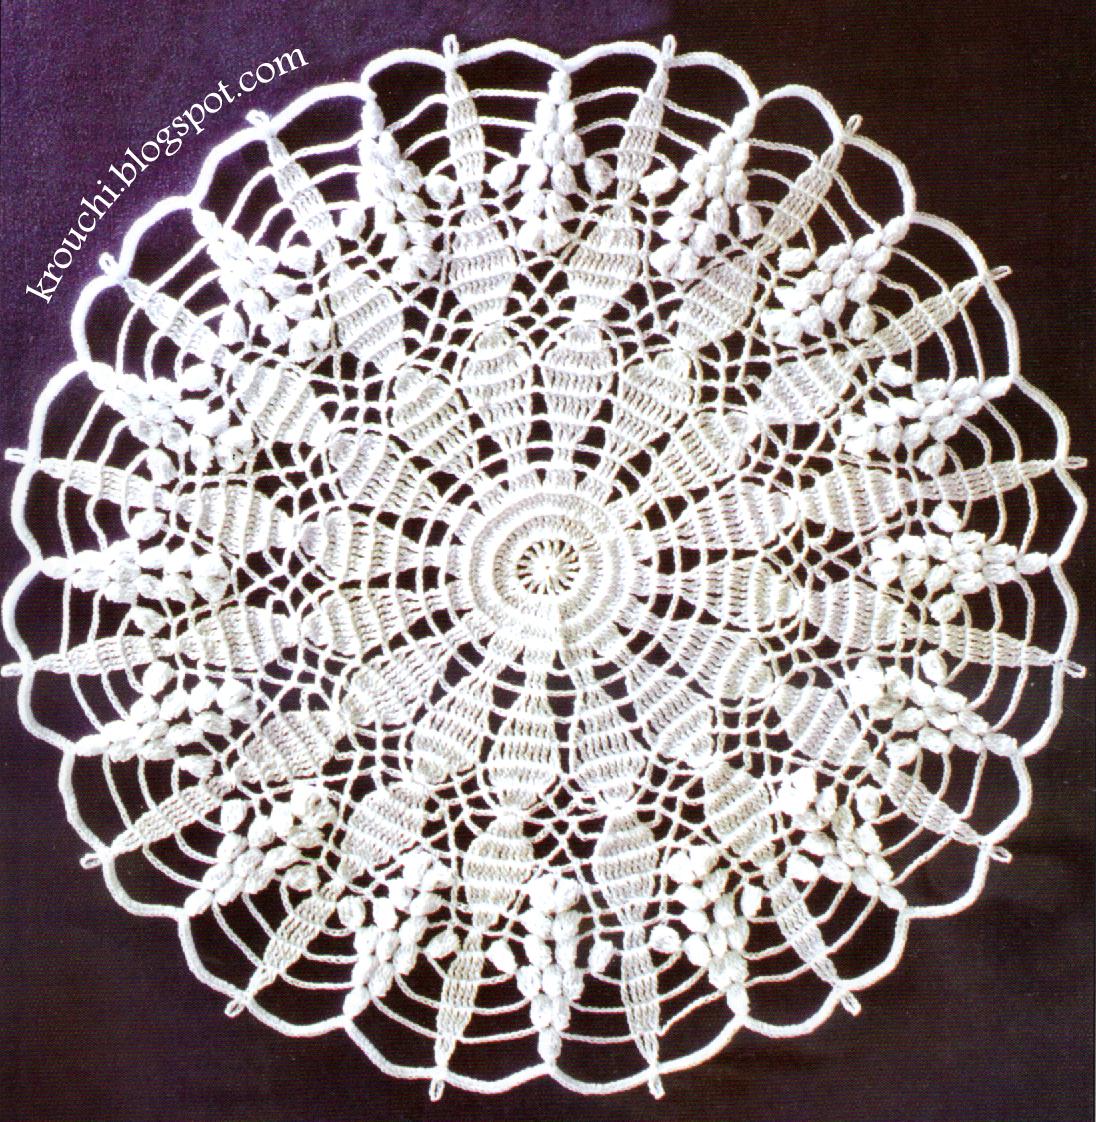 Crochet et broderie napperon deuxieme modele - Napperon dentelle crochet ...